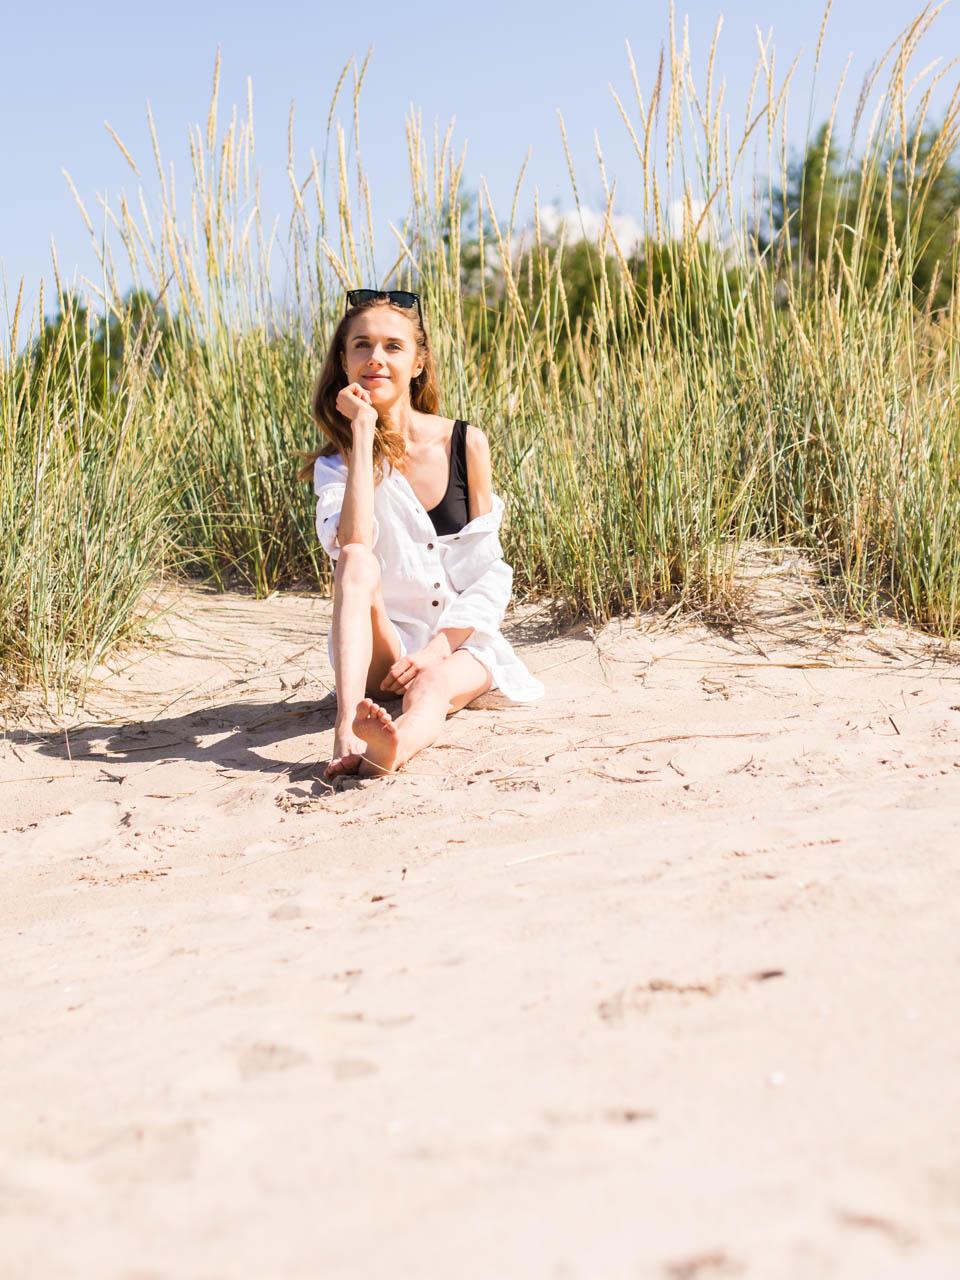 self-help-personal-development-book-recommendation-beach-fashion-kirjavinkki-rantamuoti-kesä-yyteri-muotiblogi